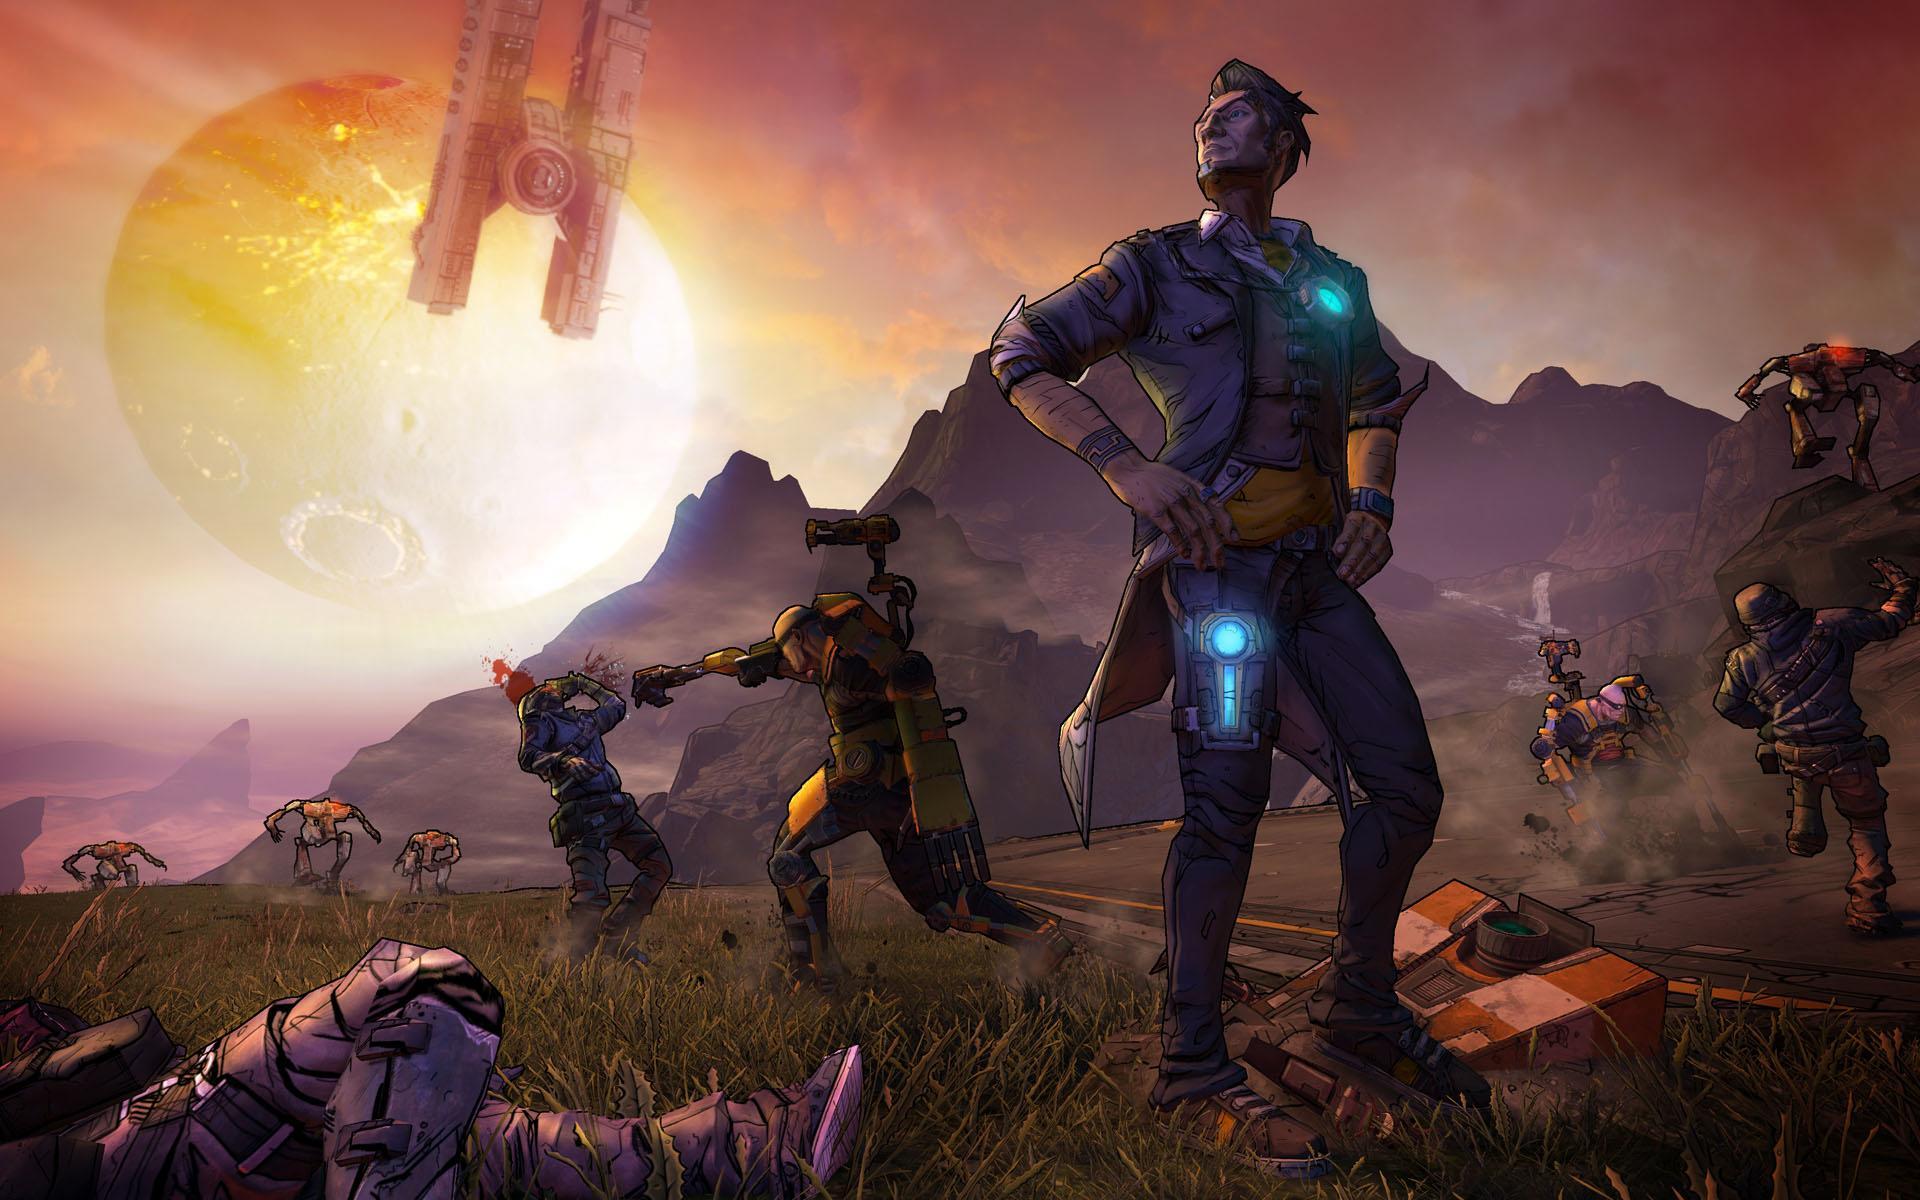 New Action Games For Ps3 : Borderlands arrives in spring alongside the u s ps